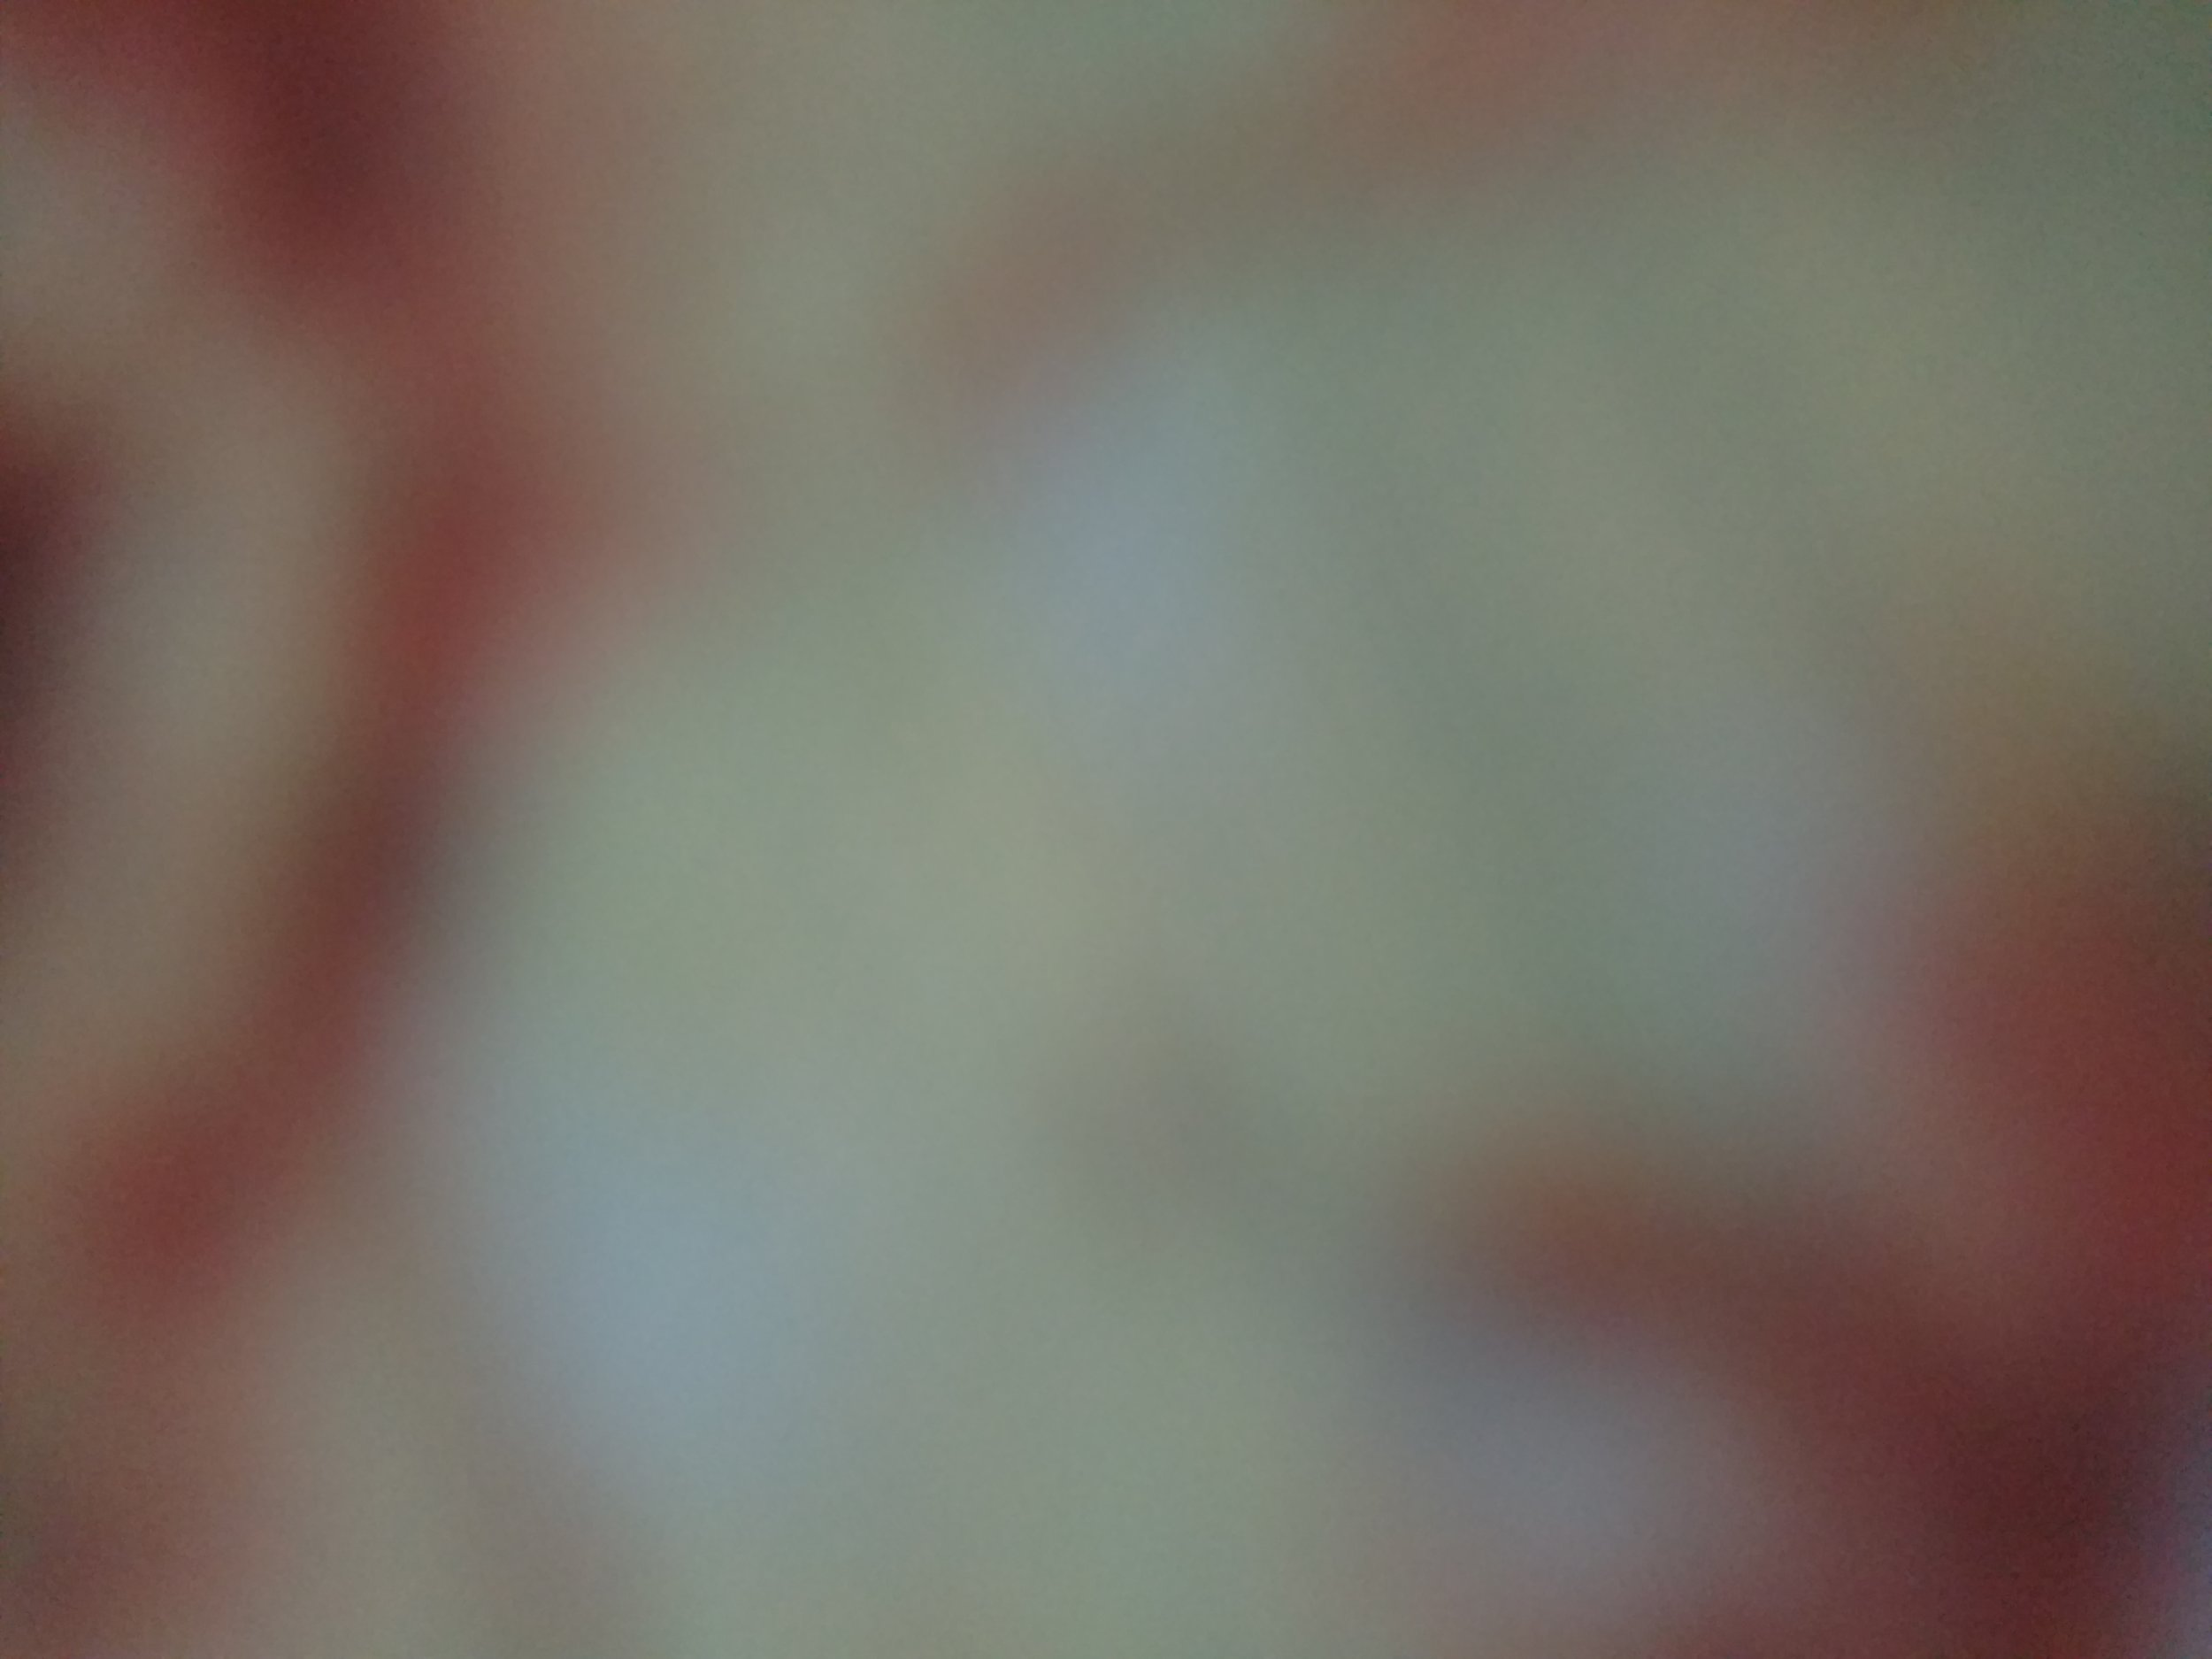 willroth-co-free-texture-gradient-075.jpg